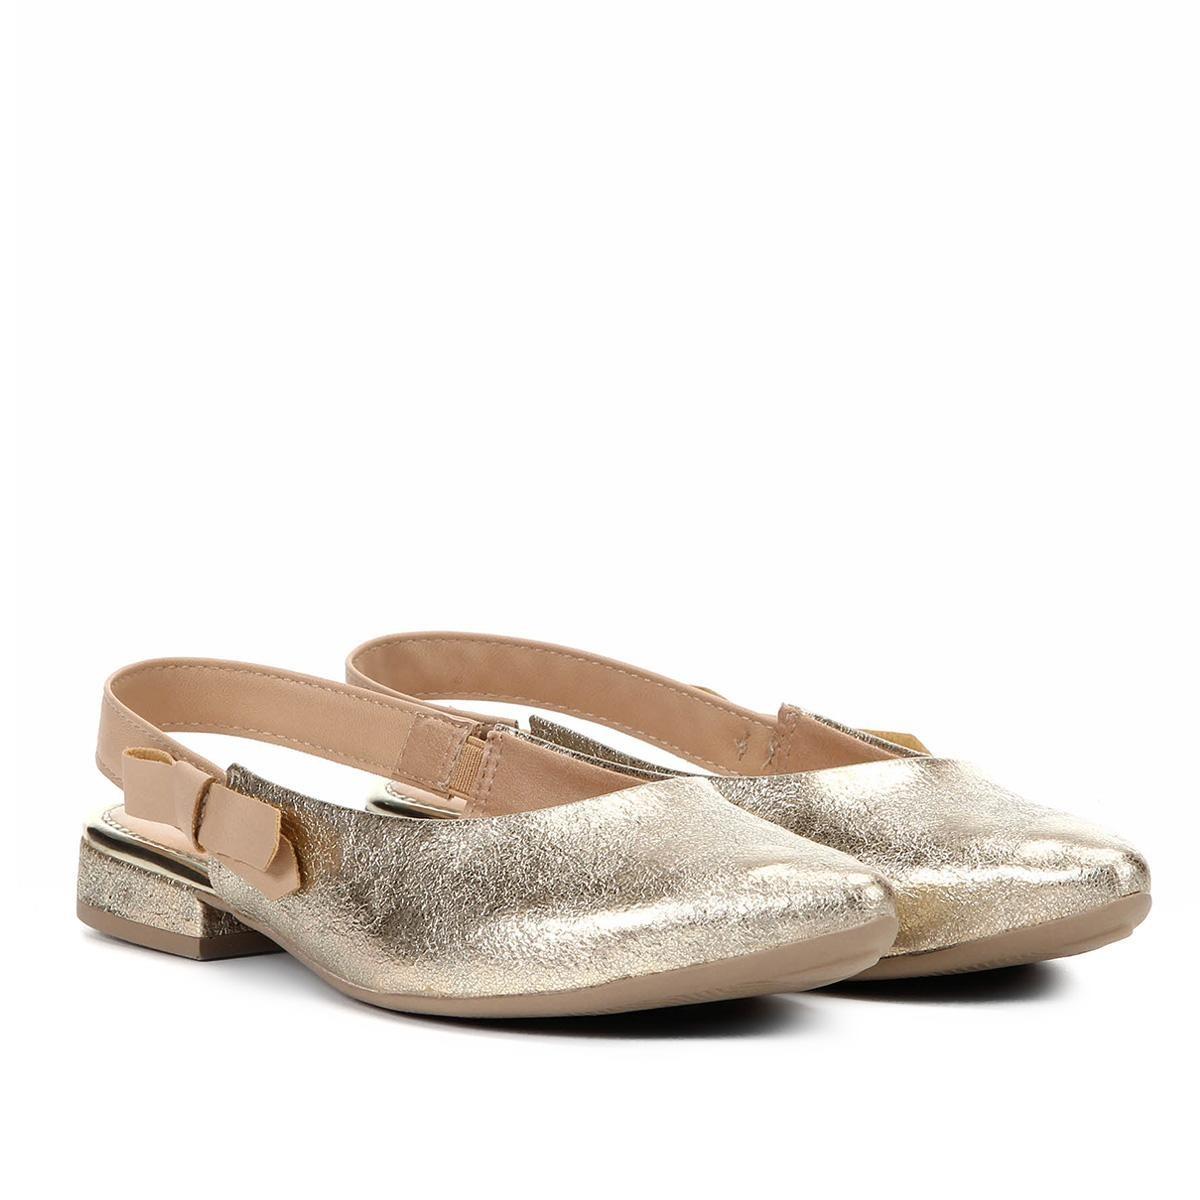 4c16a4563 sapatilha mississipi chanel bico fino metalizada feminina. Carregando zoom.